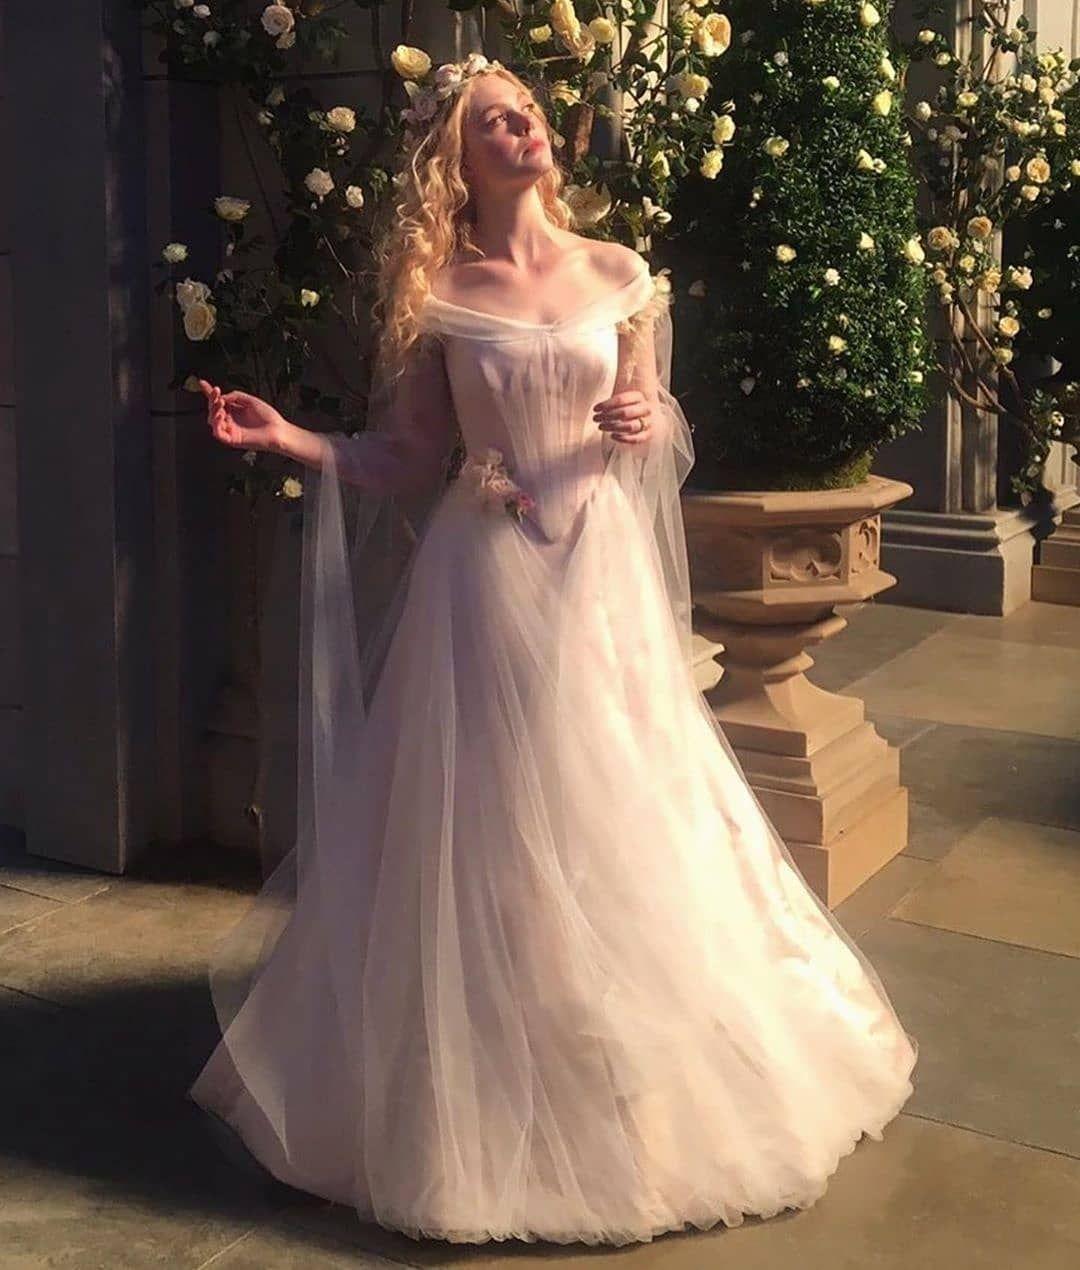 Hera dresses on instagram h e r a via ellefanning